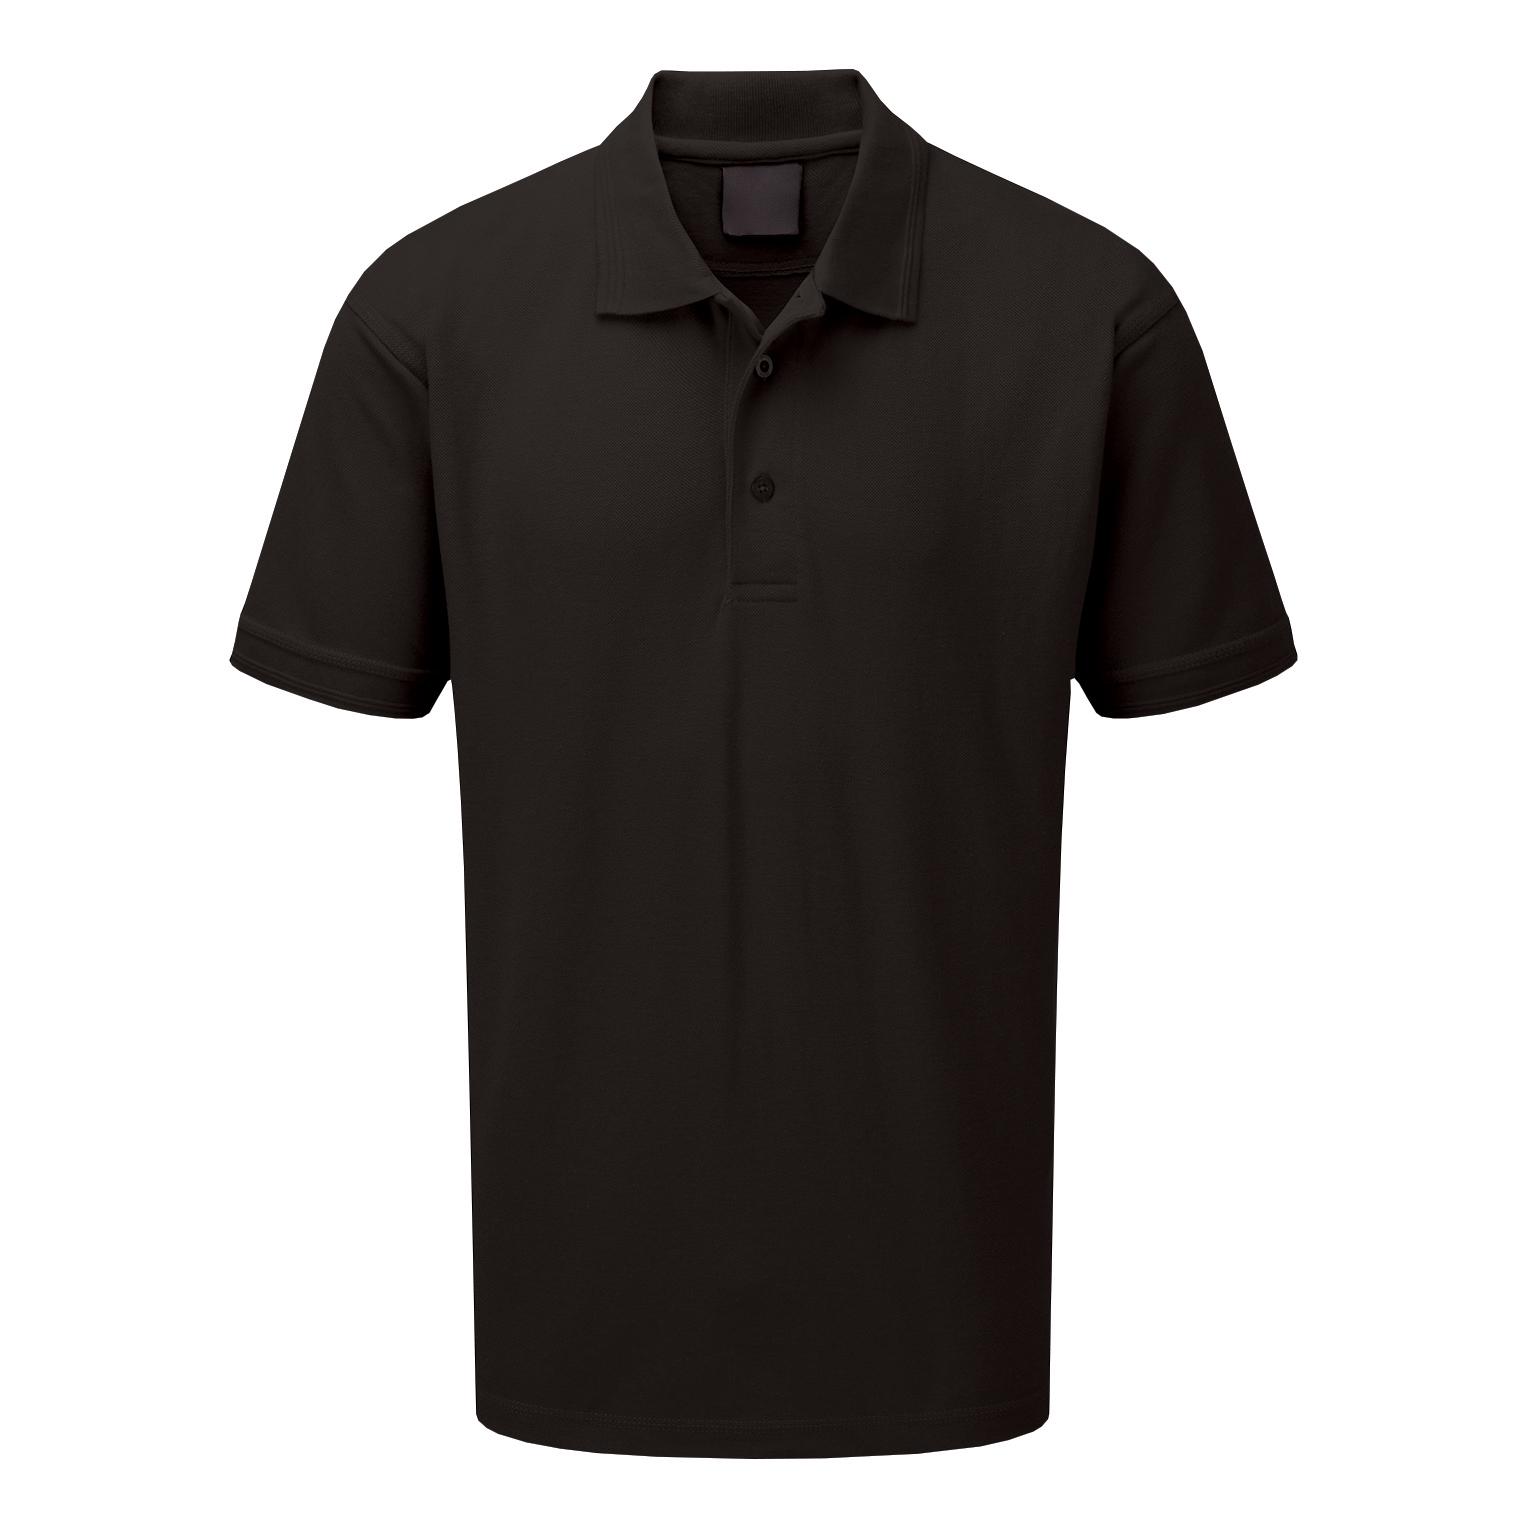 Premuim Polo Shirt Shirt Classic Polycotton 200gsm XS Black Ref CLPKSBLXS *Approx 3 Day Leadtime*